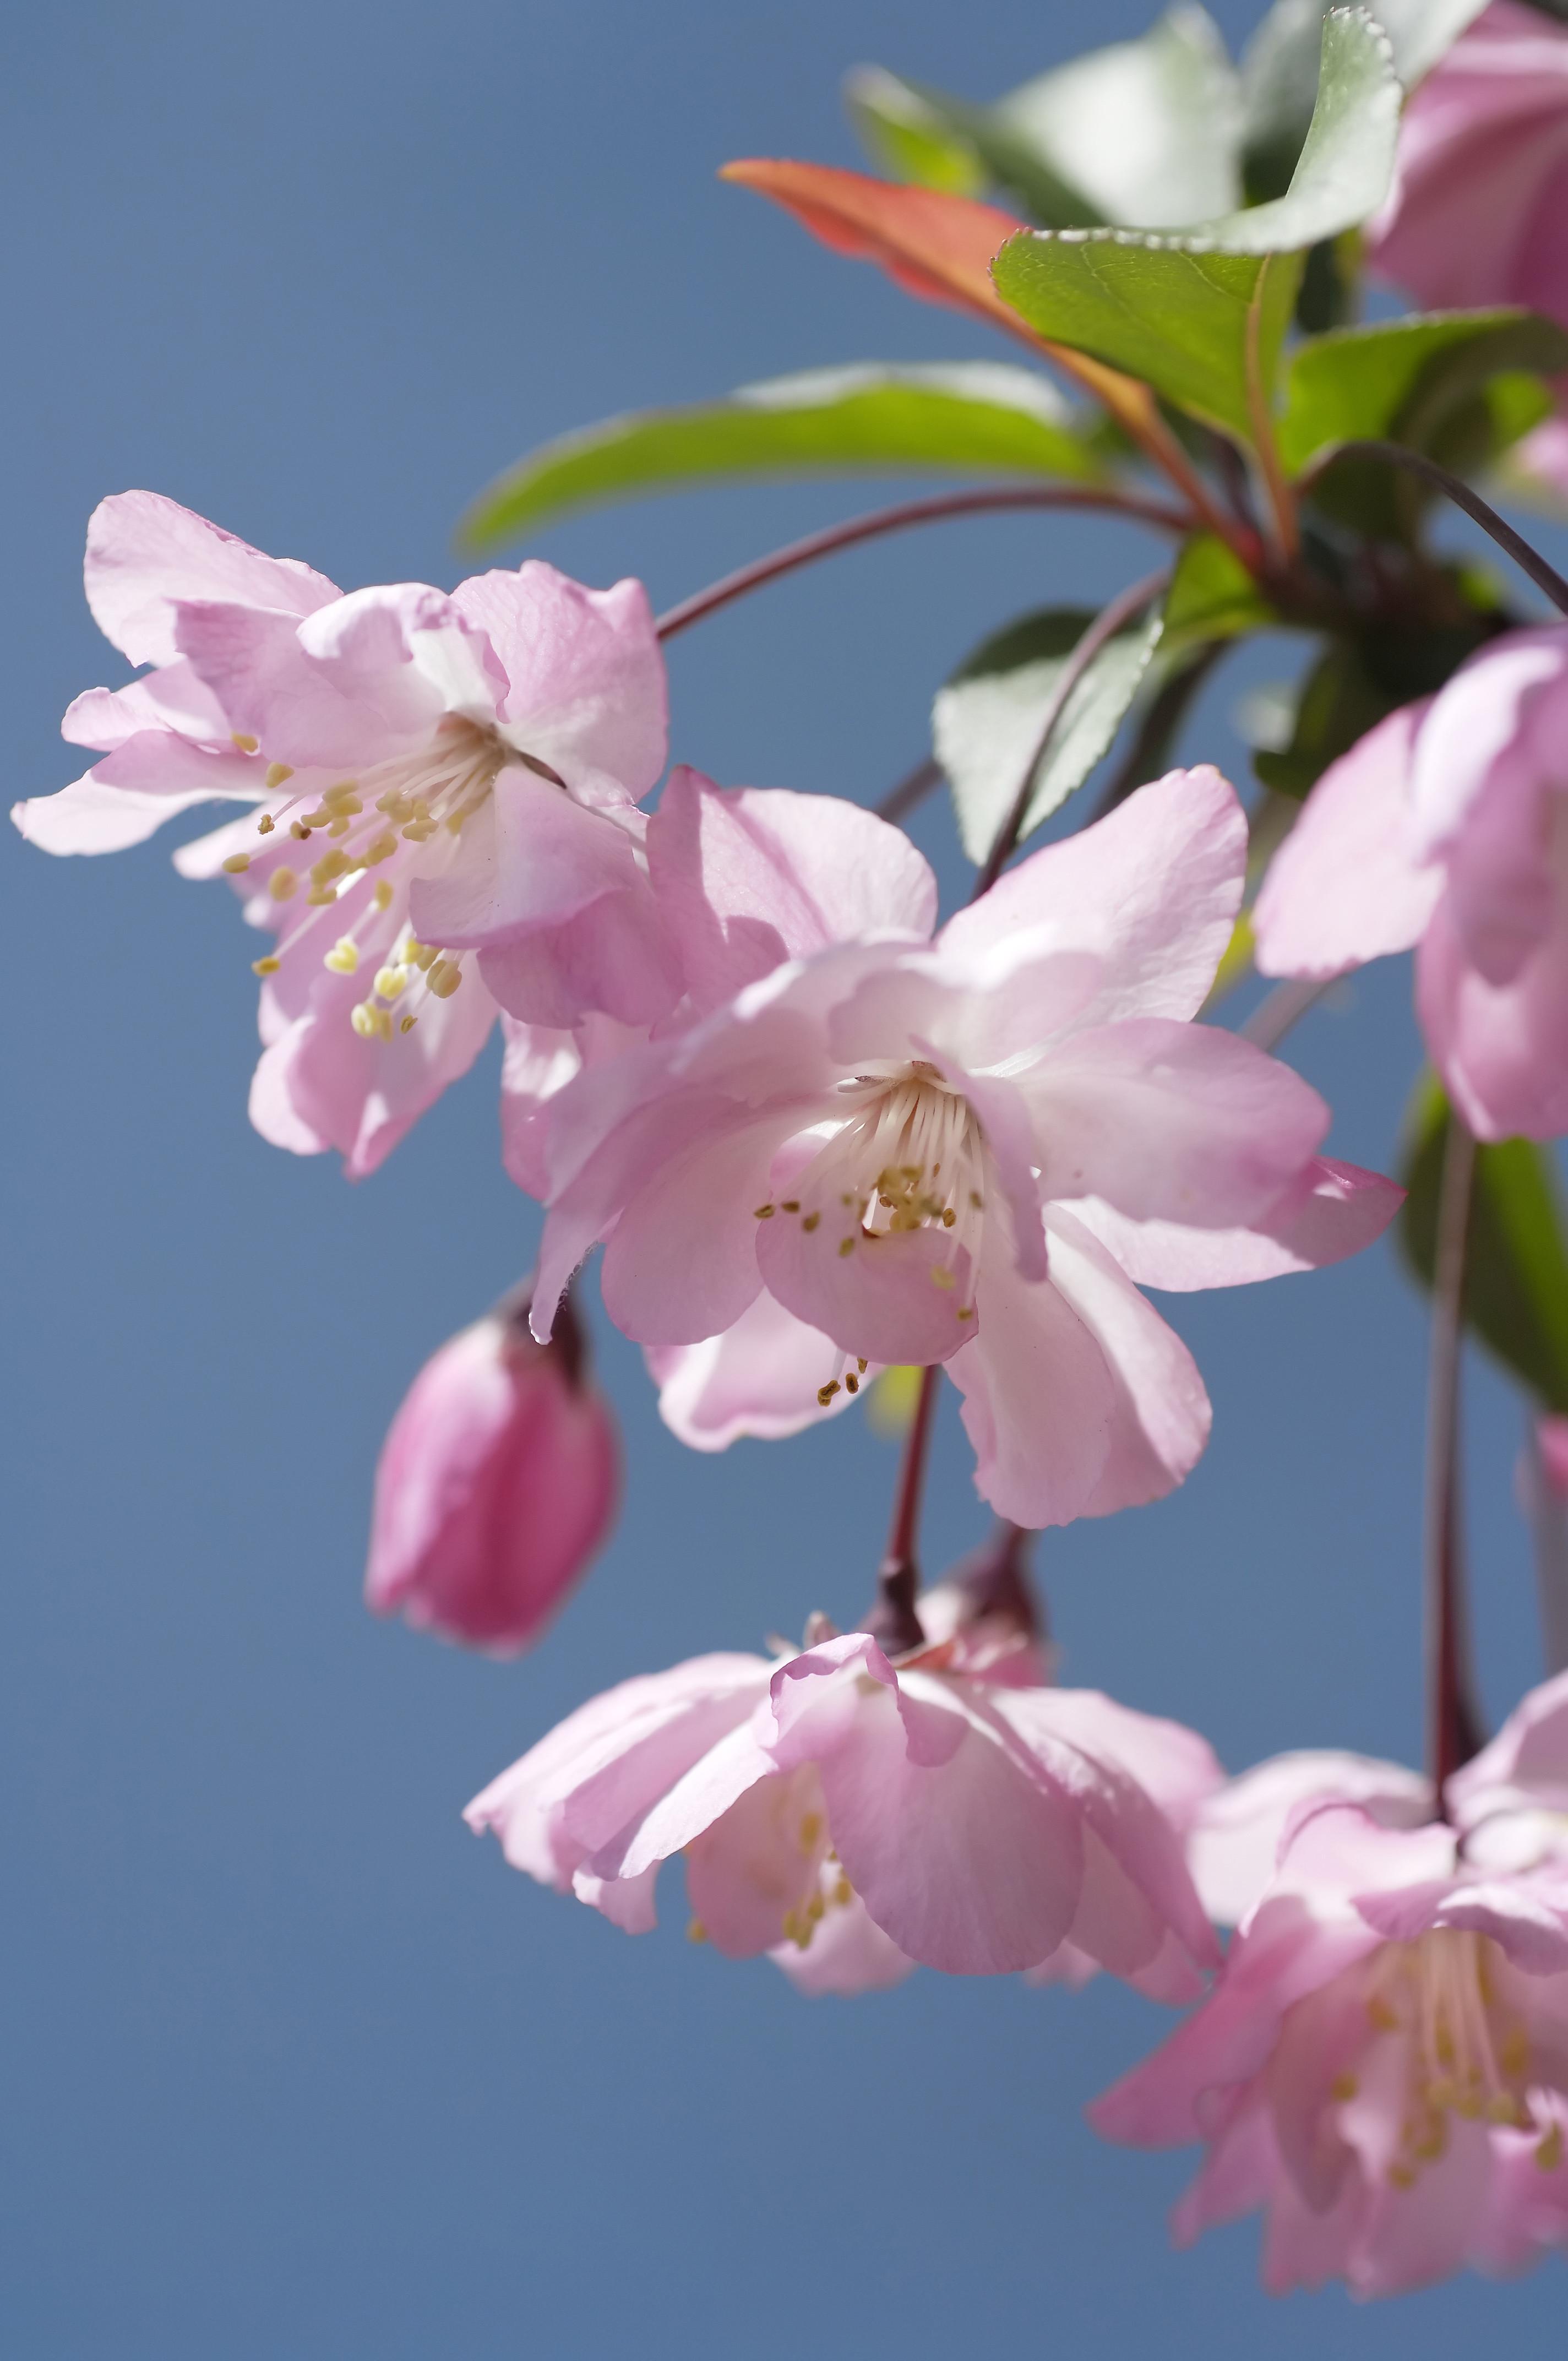 22393e063b101 桜は咲きましたが、今日も風は冷たかったですね。 6日は、敦賀市内の小中学校の入学式。 明日は、早翠の入園式と両園の始業式。